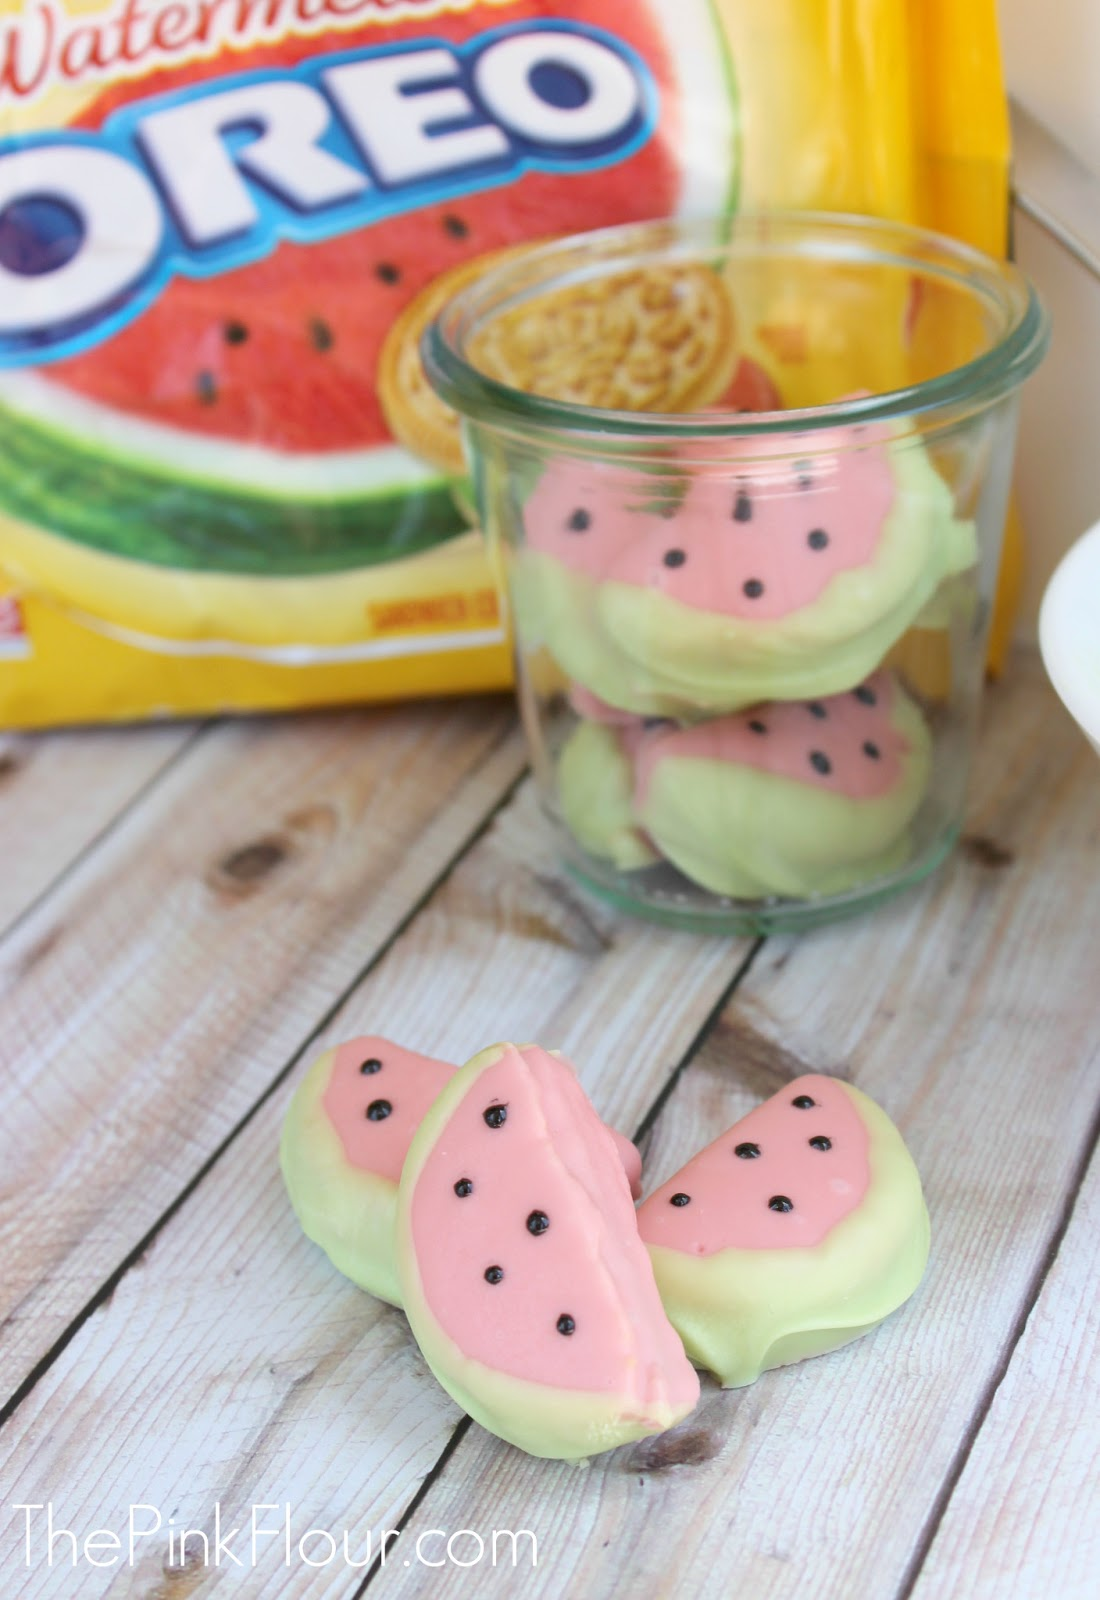 Chocolate Covered Watermelon Oreos - watermelon Oreos made to look like watermelon slices